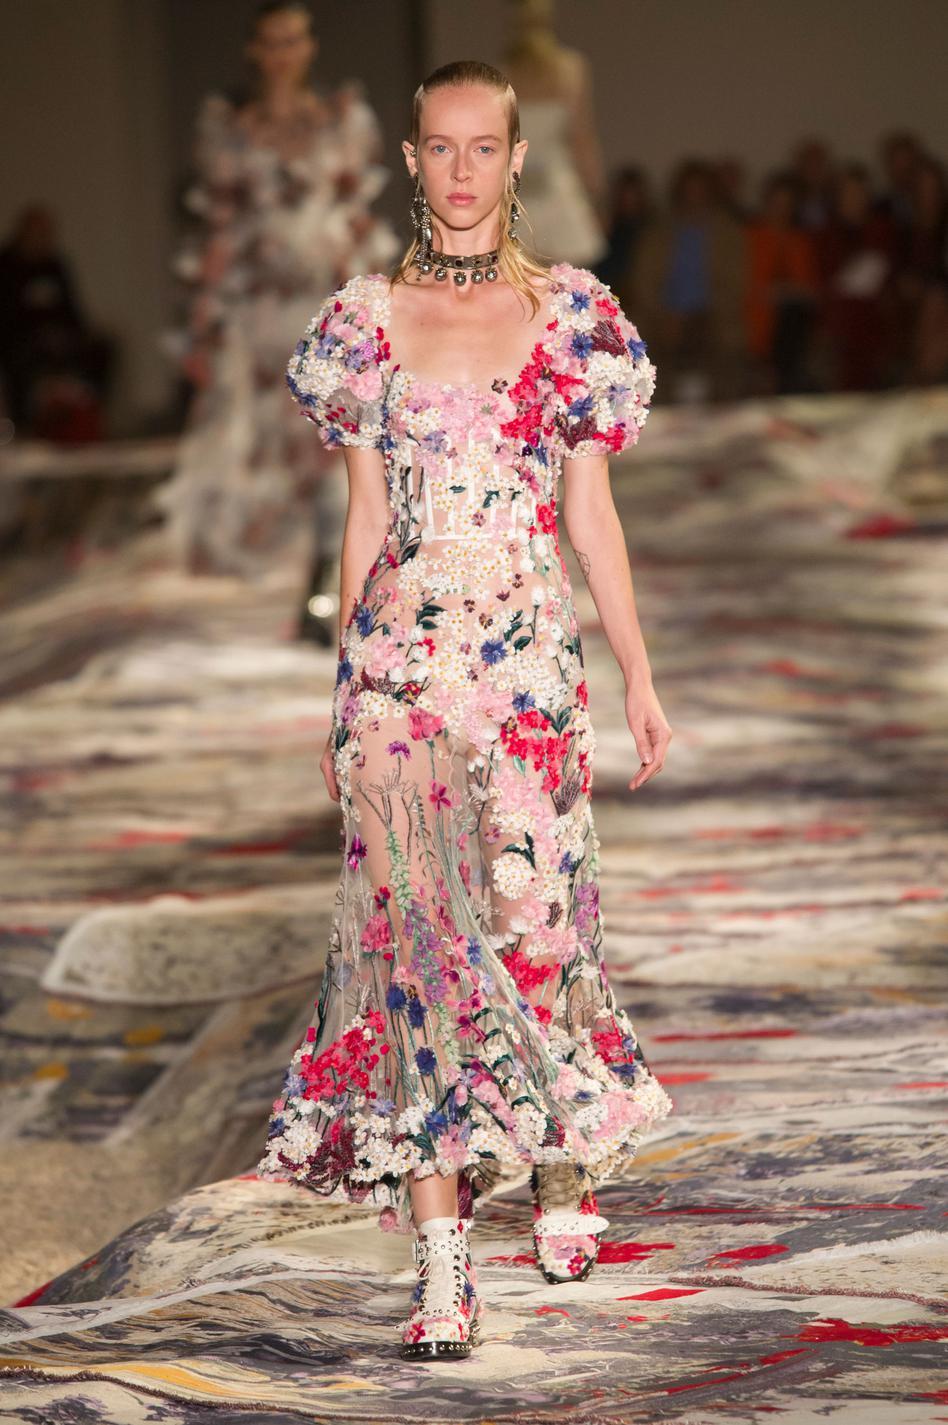 Quelle tenue portera Kate Middleton au mariage de sa sœur Pippa ? - Alexander McQueen